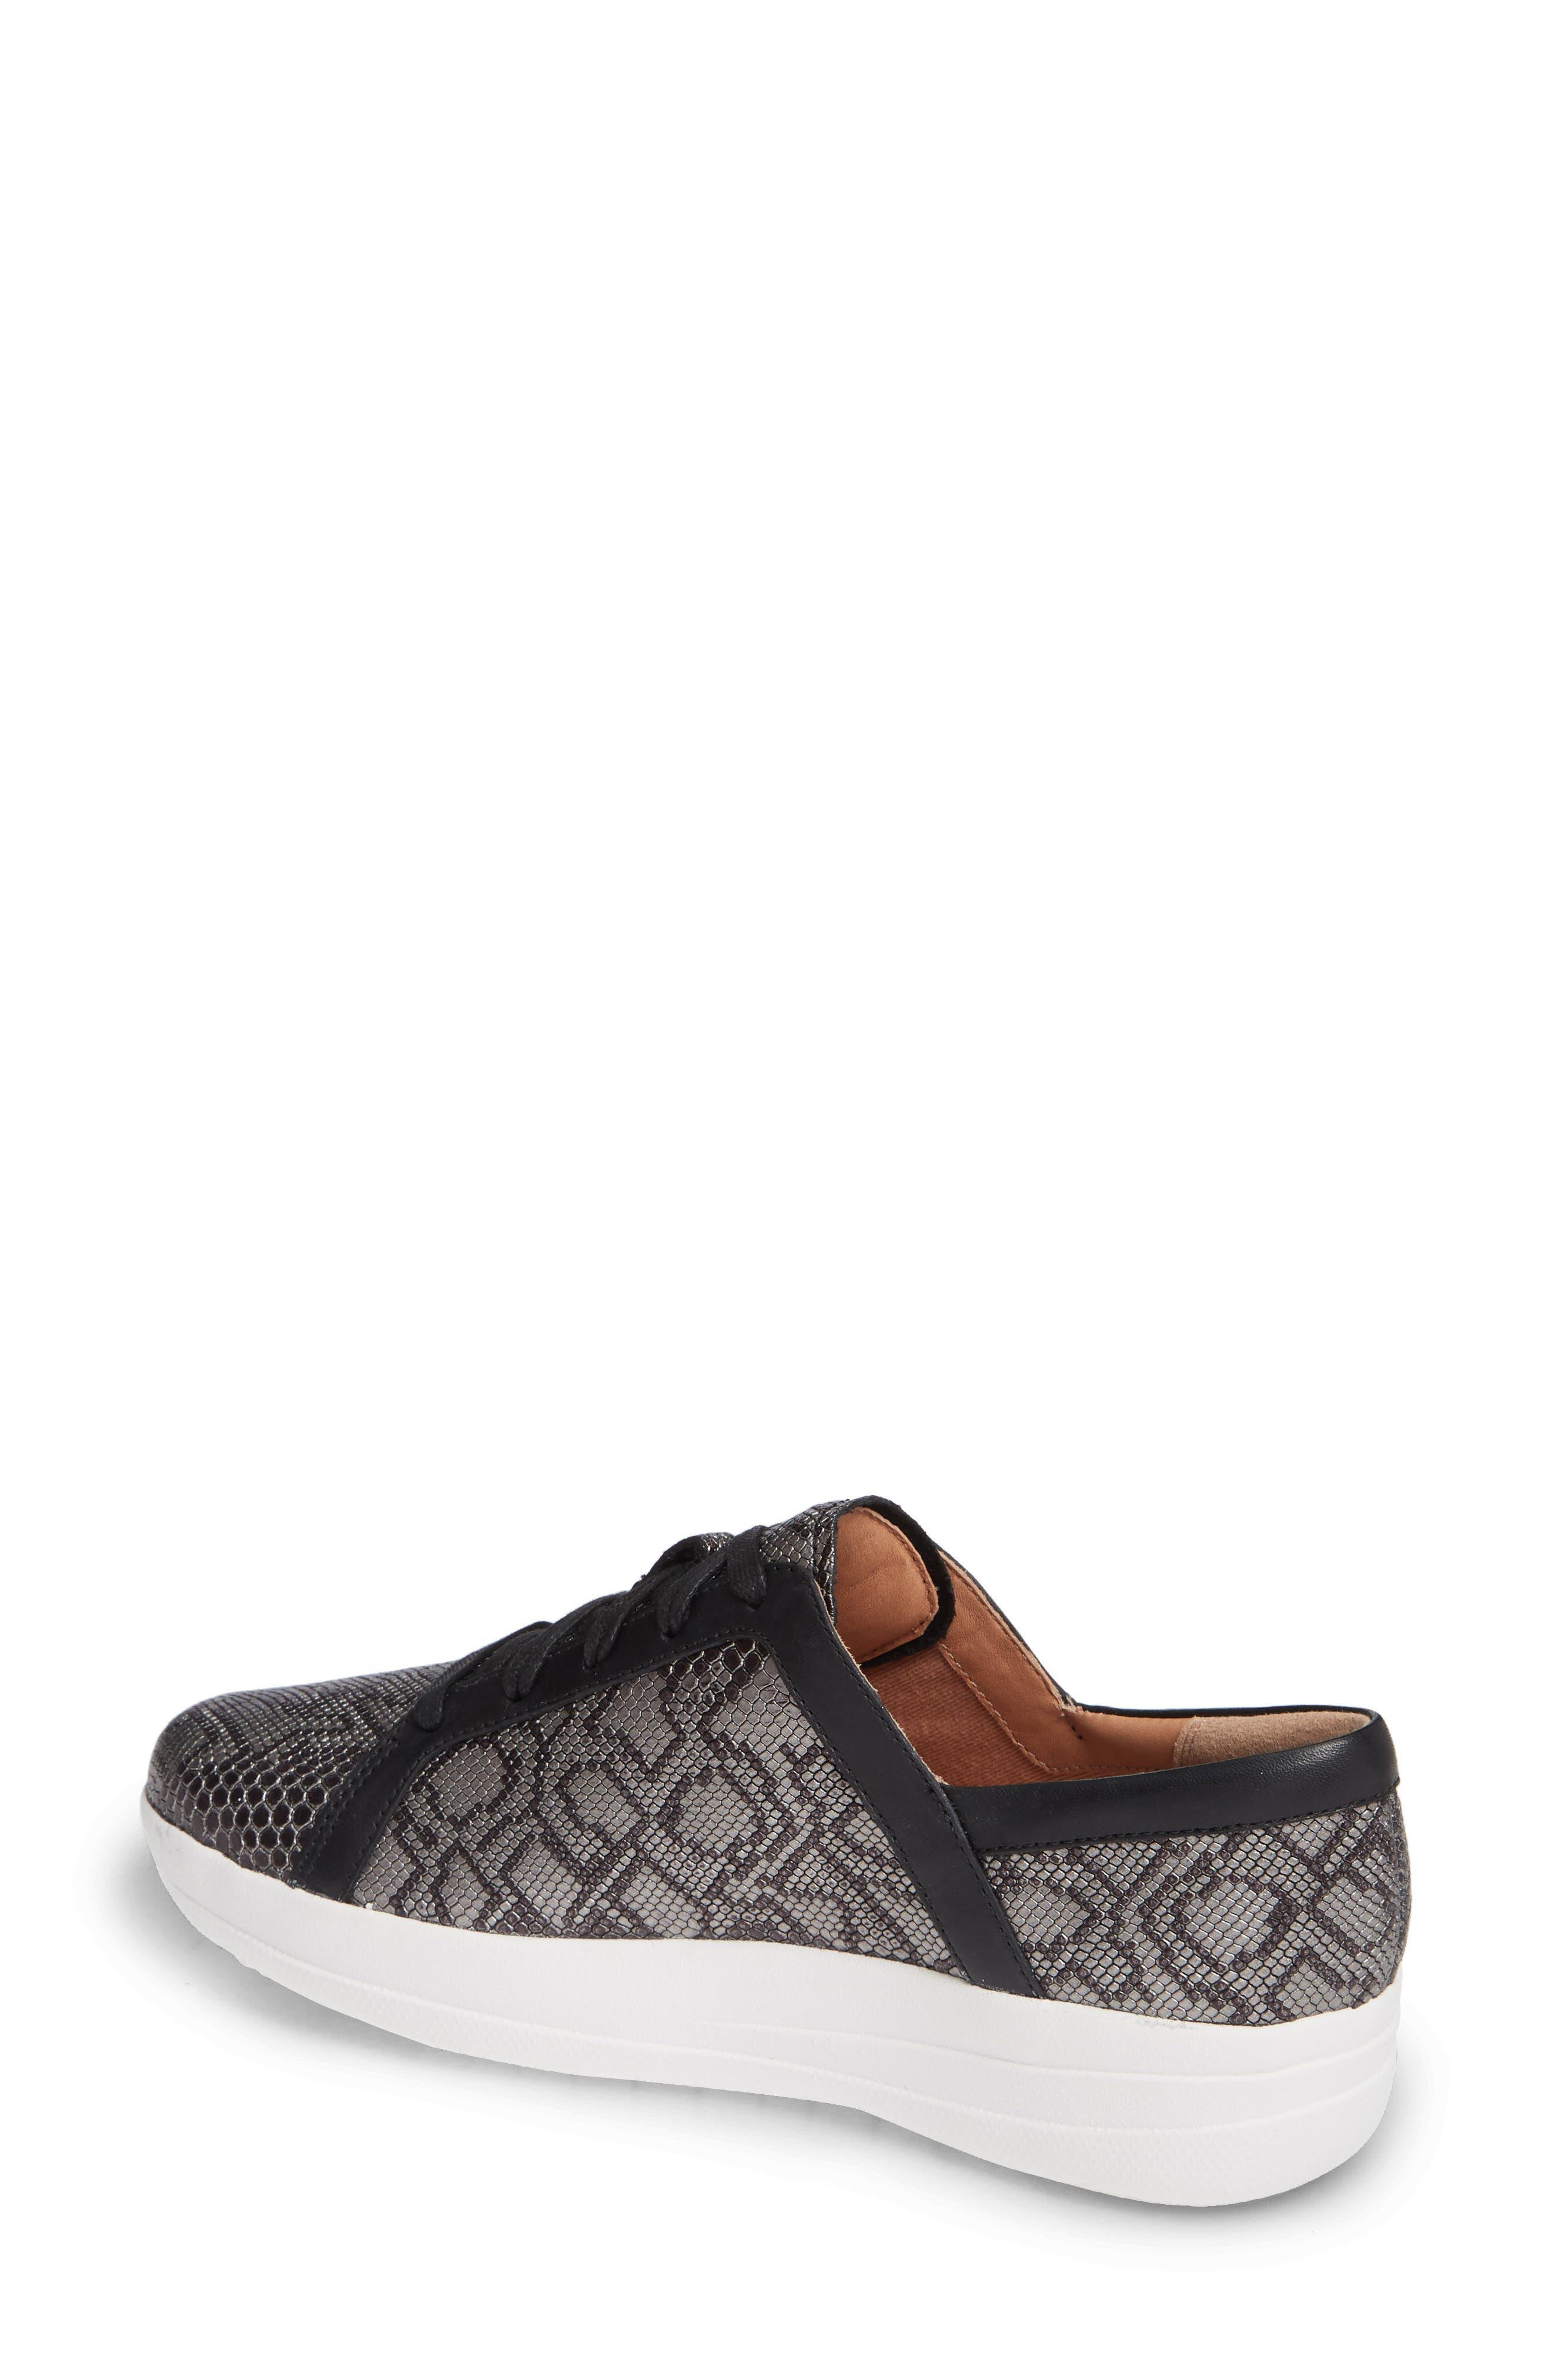 FITFLOP,                             F-Sporty II Sneaker,                             Alternate thumbnail 2, color,                             001